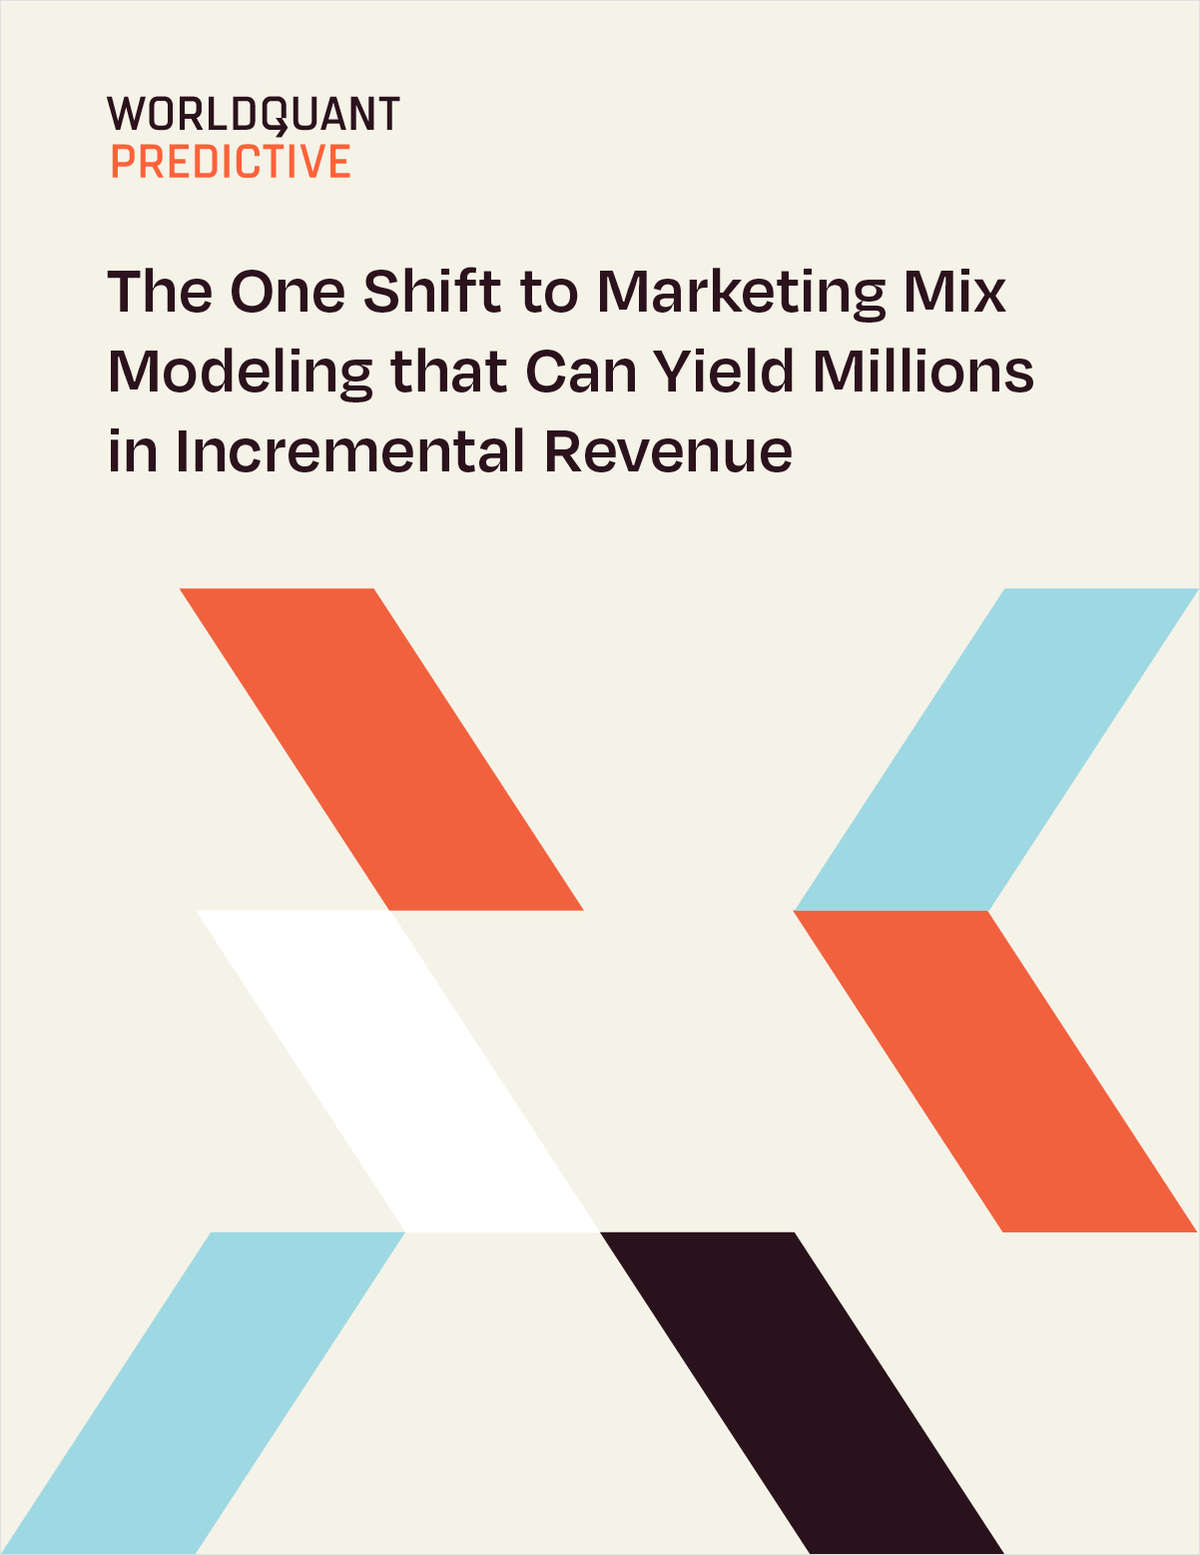 The Keys to Optimizing Retail Marketing Budgets at Data Driven Companies